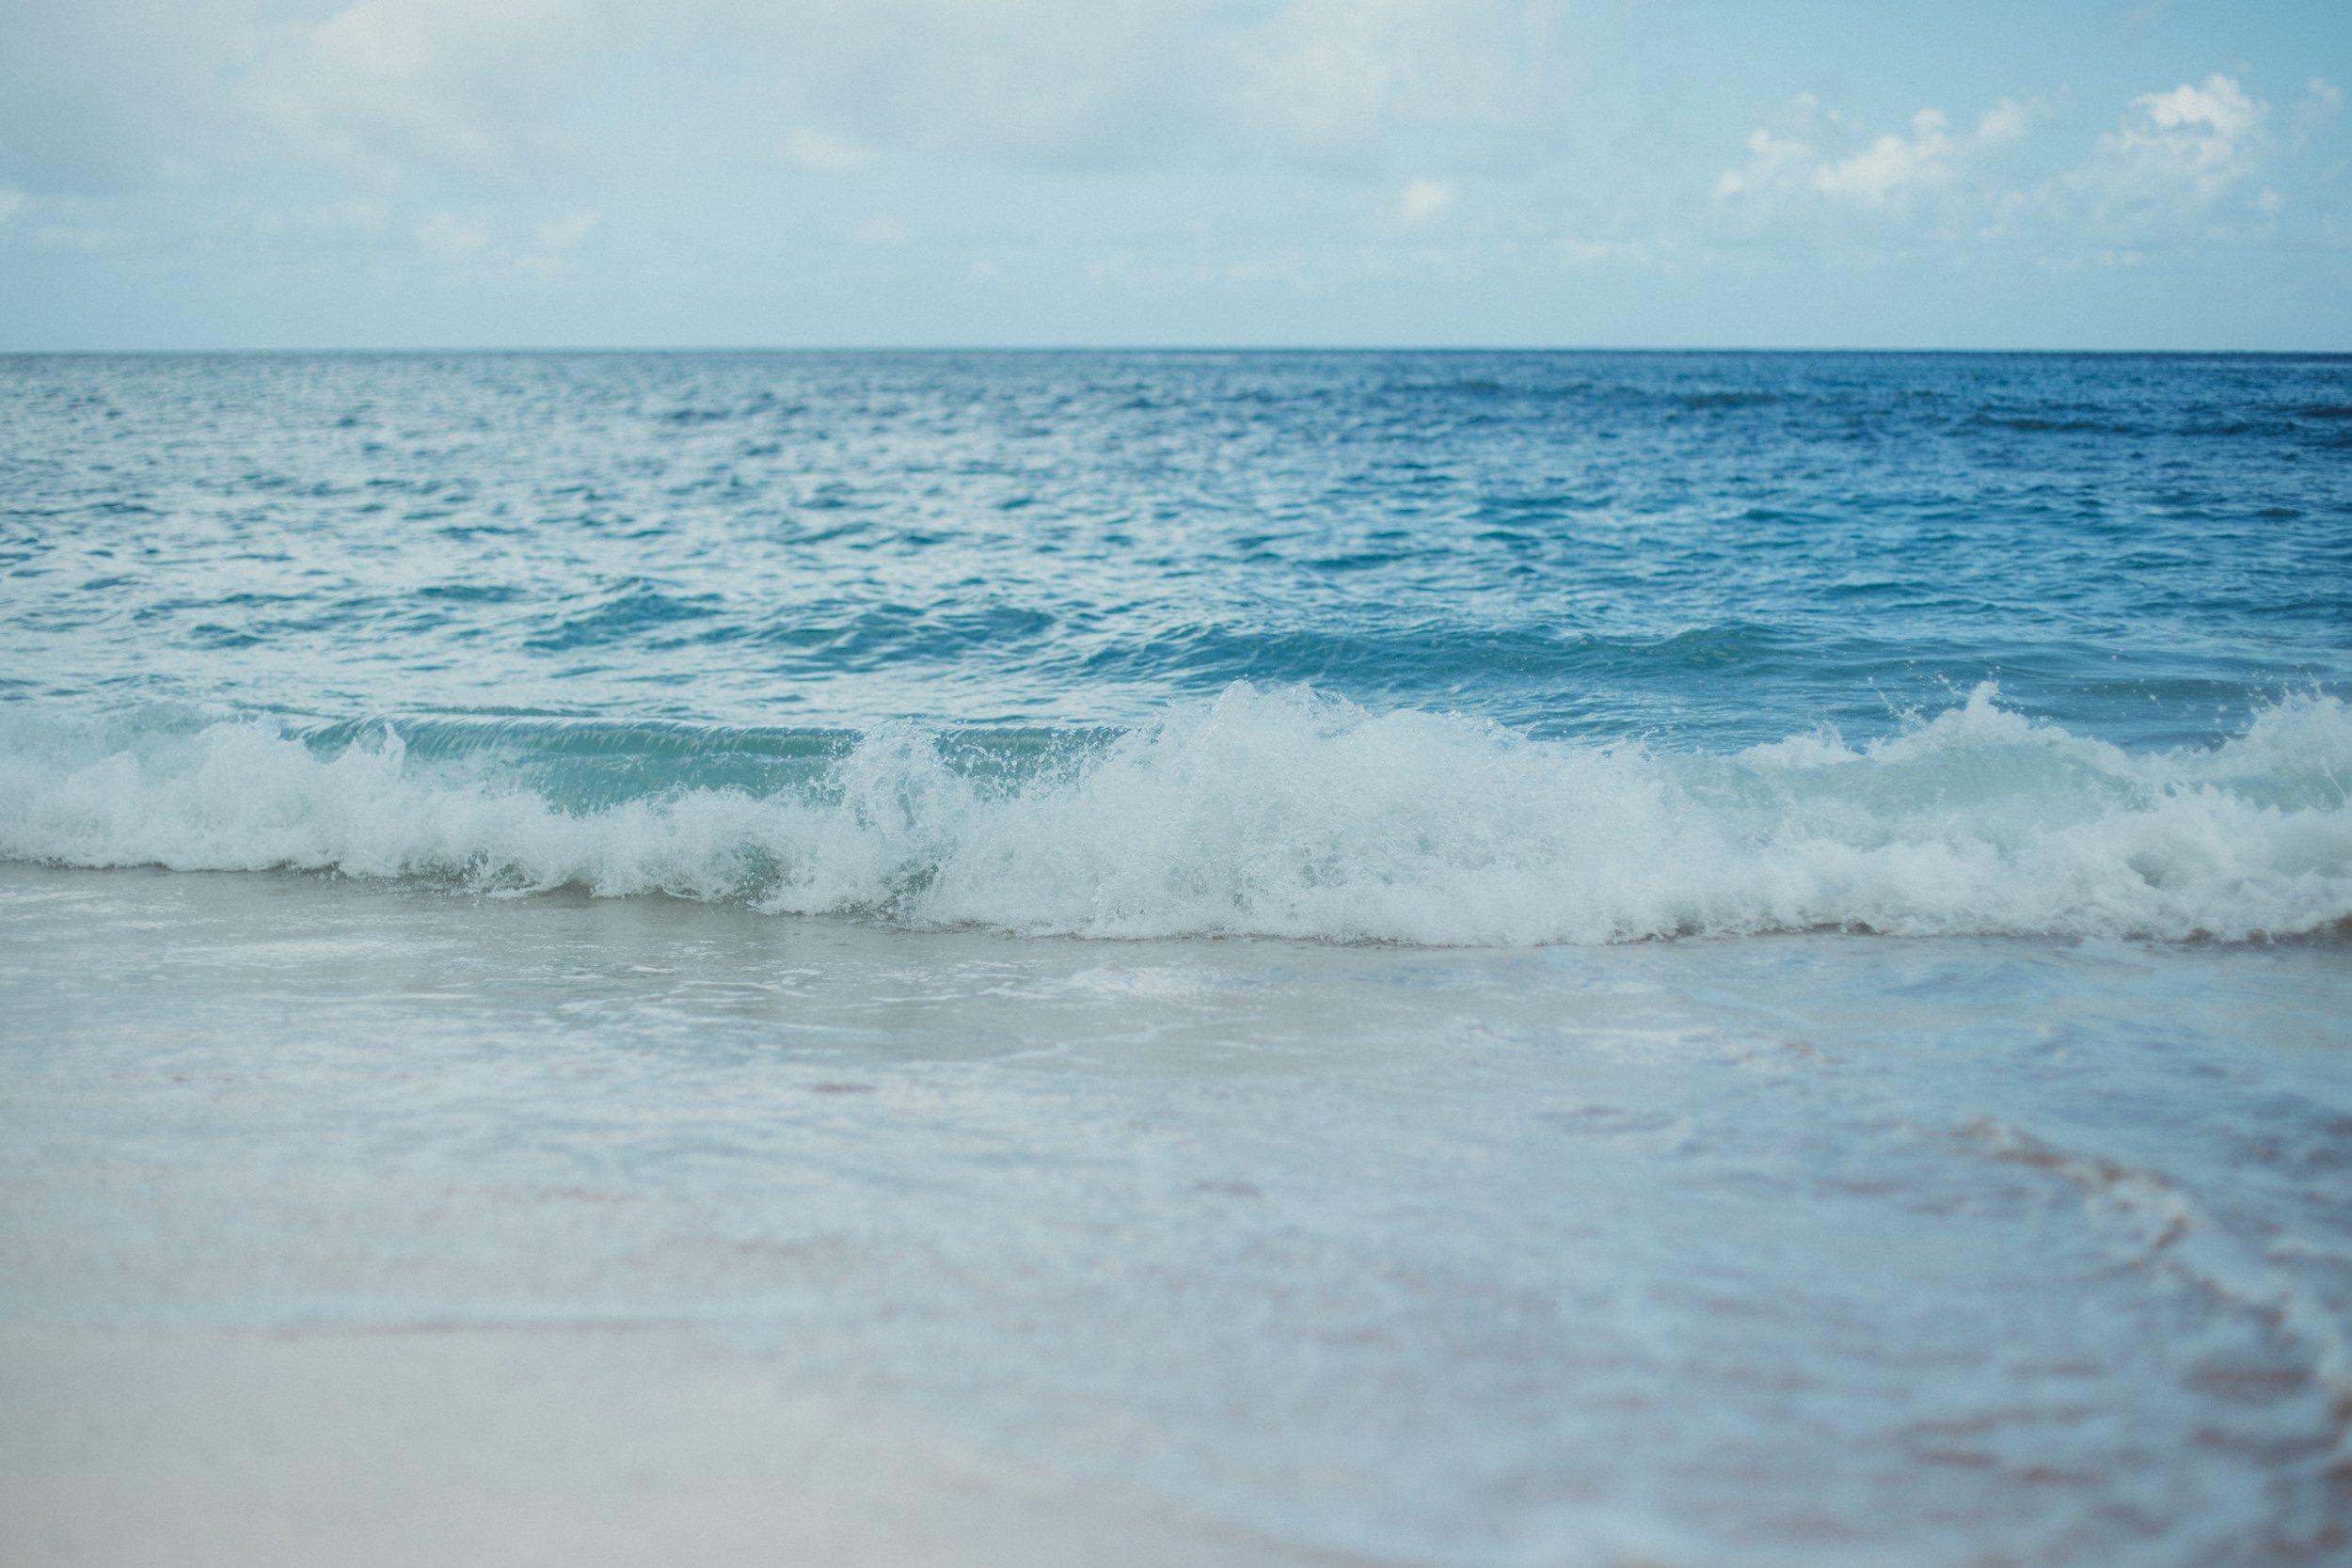 beach-sea-coast-water-nature-sand-719330-pxhere.com.jpg